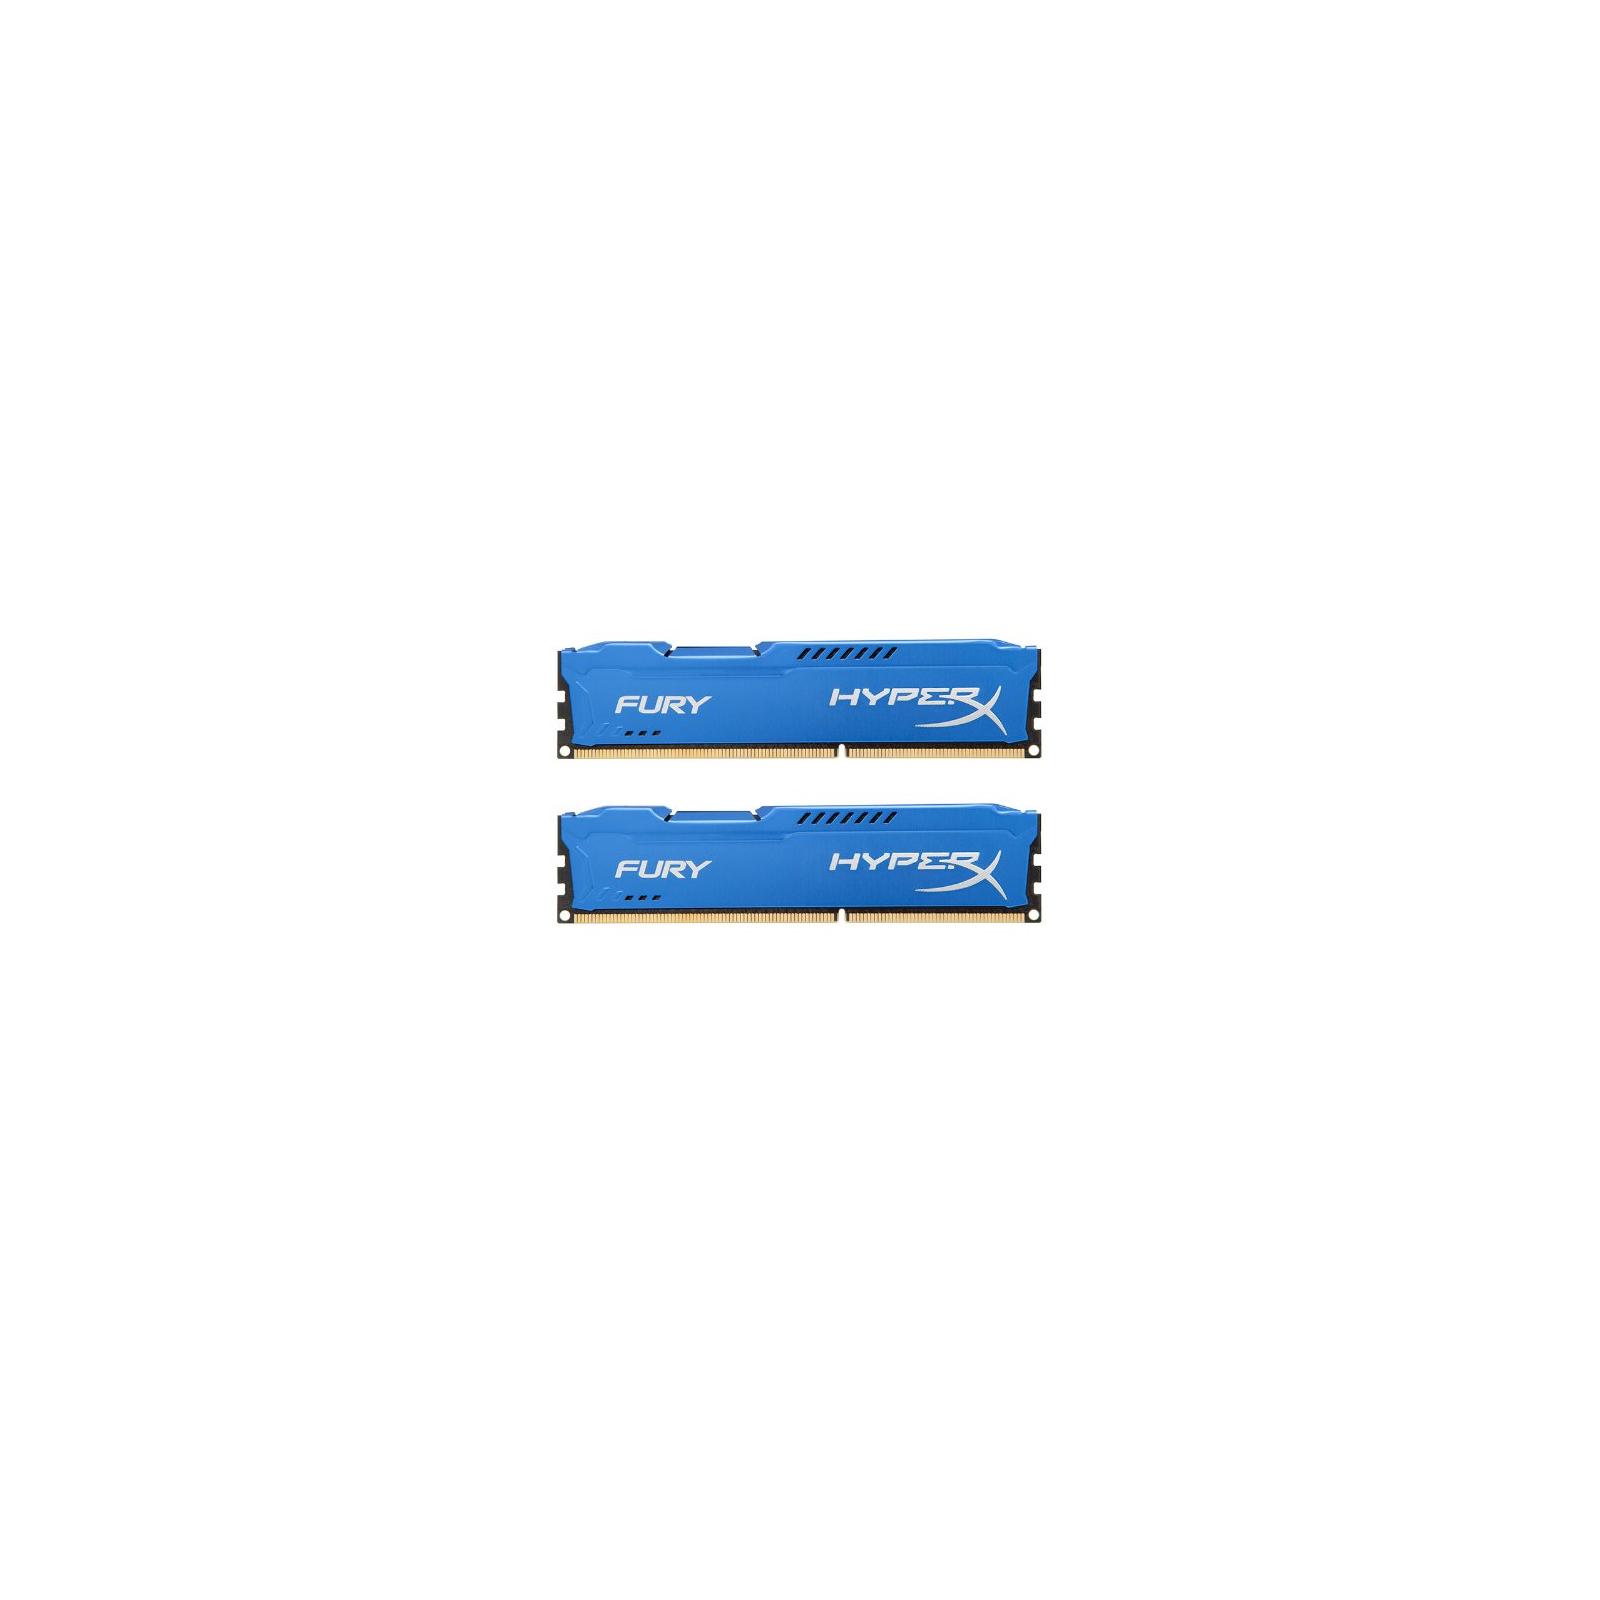 Модуль памяти для компьютера DDR3 16Gb (2x8GB) 1866 MHz HyperX Fury Blu Kingston (HX318C10FK2/16)